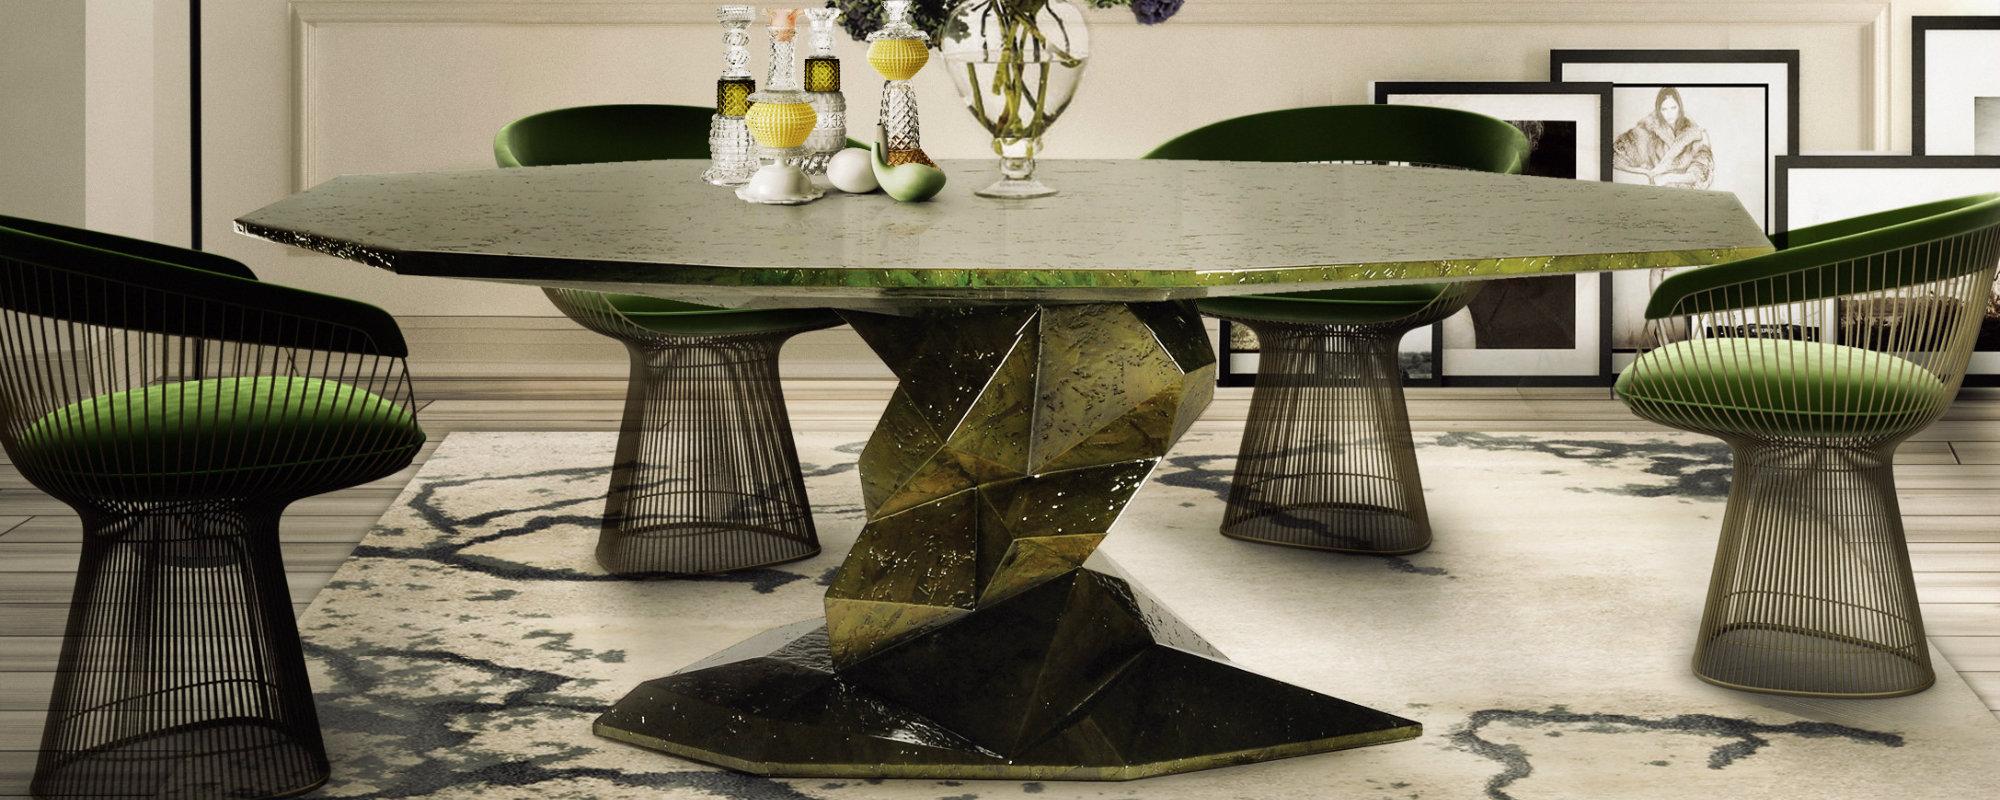 Tendencia de Mercado 2018: Las mesas para comer de la Boca de Lobo Tendencia de Mercado 2018 Tendencia de Mercado 2018: Las mesas para comer de la Boca de Lobo feature